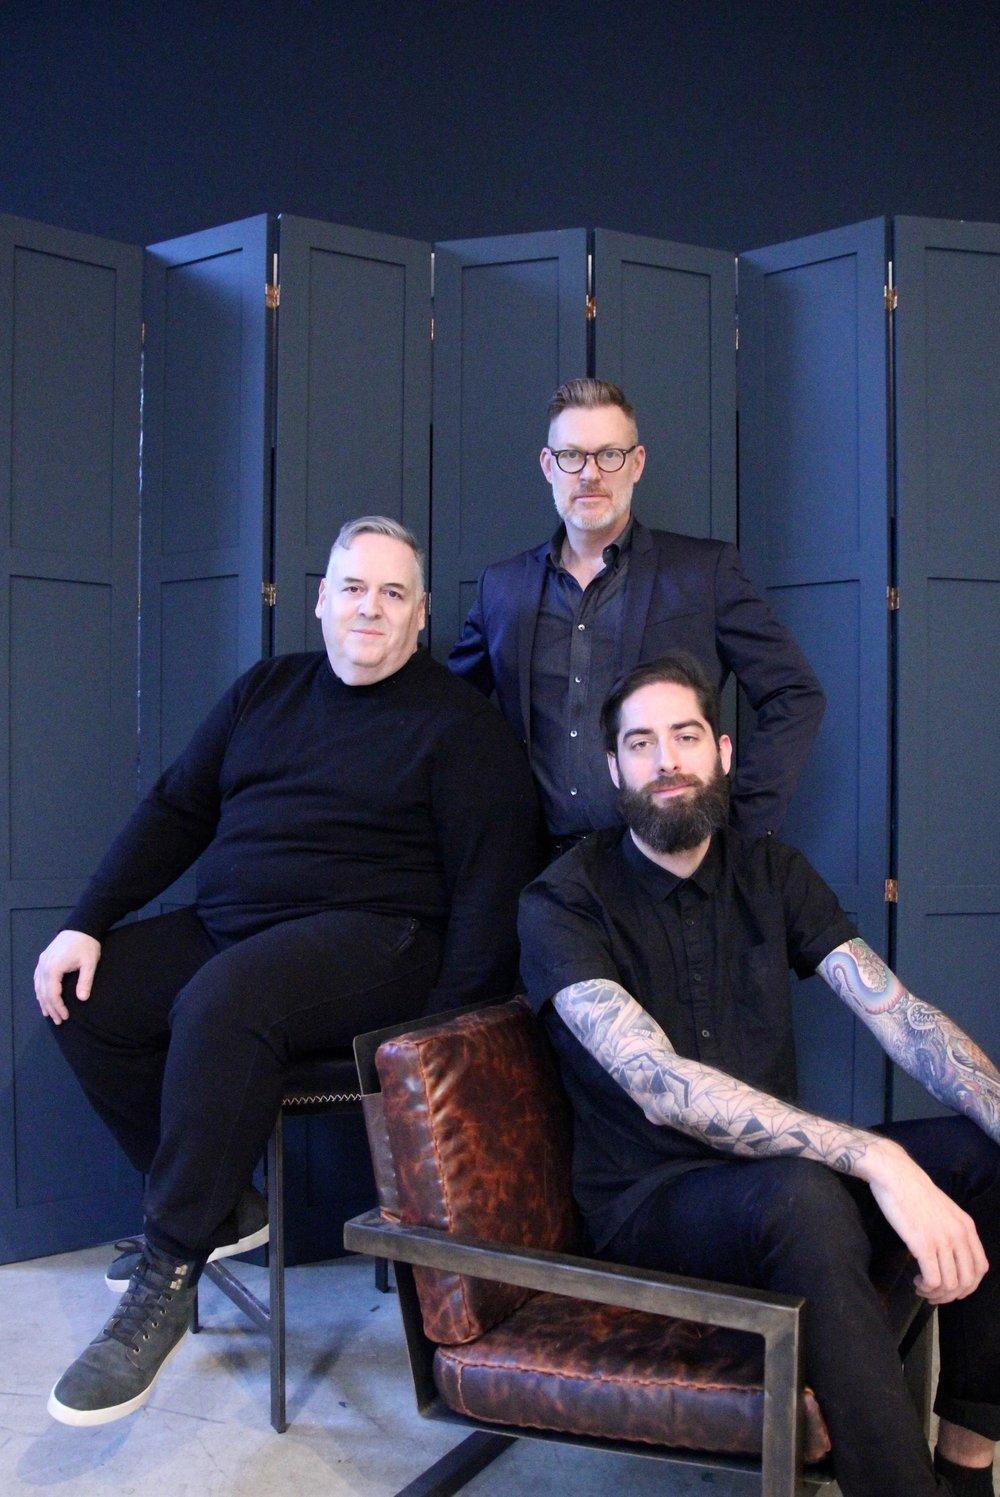 the guys.jpg